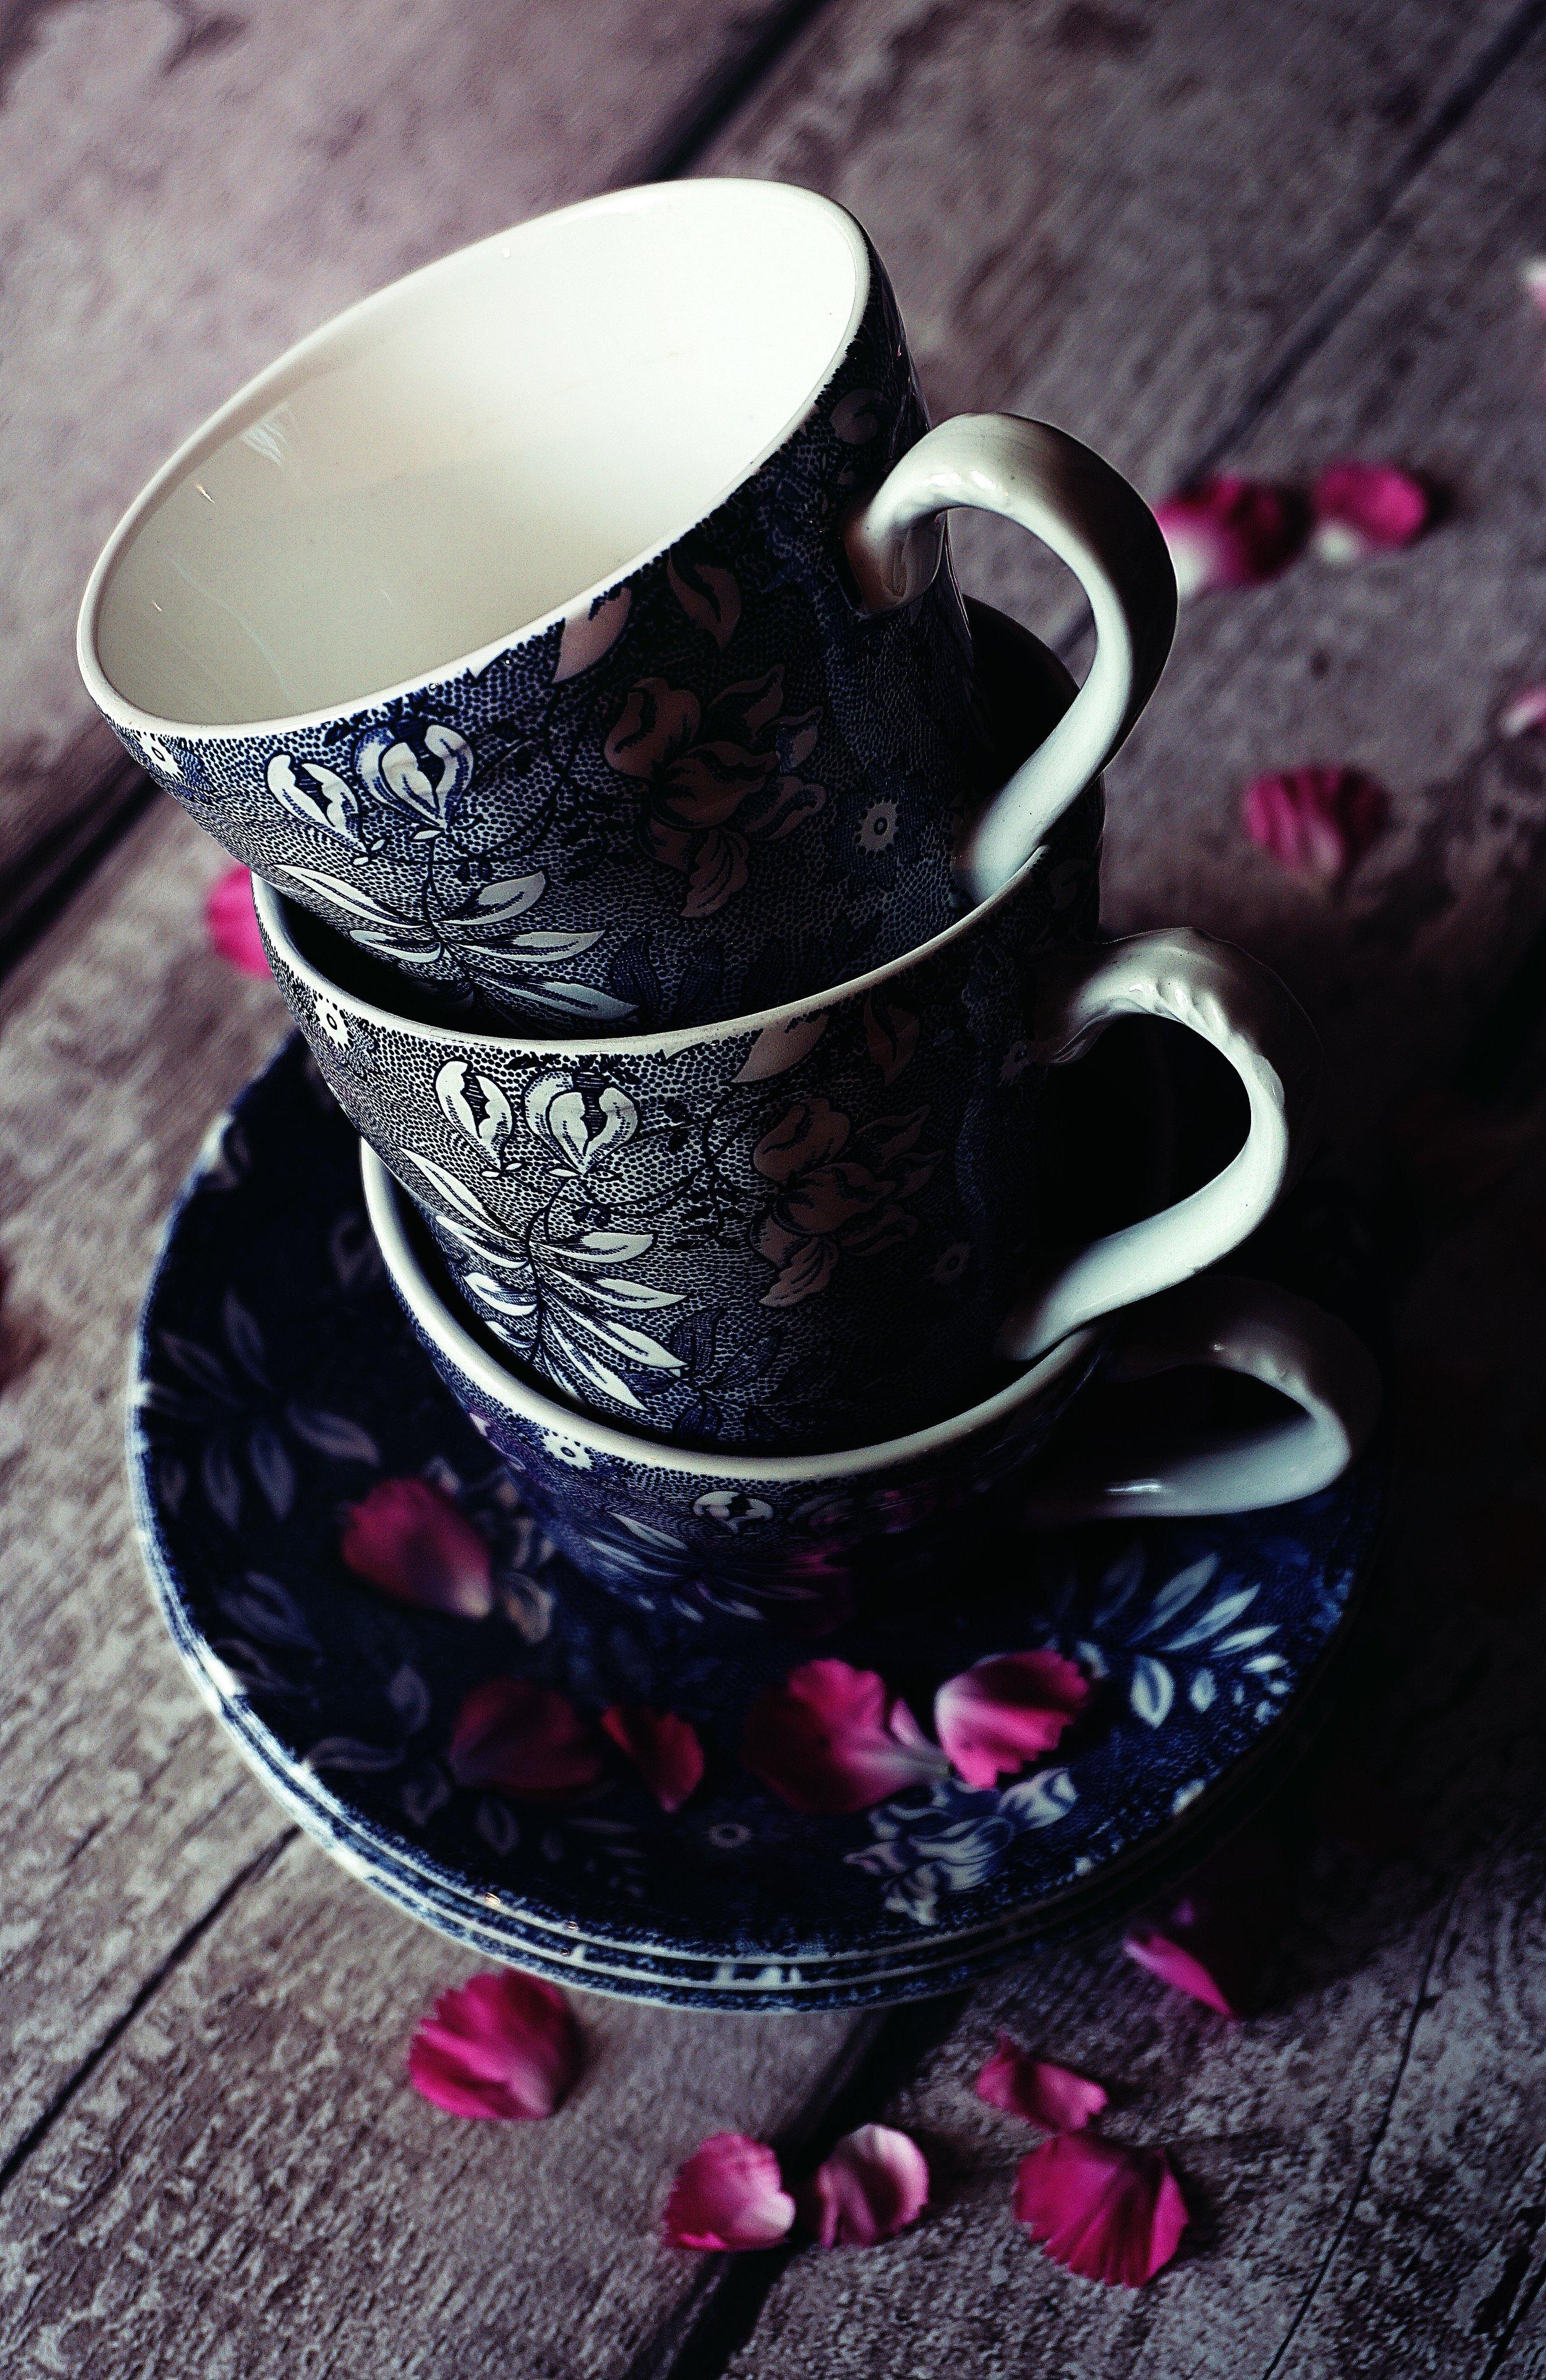 breakfast-close-up-cups-1458097.jpg